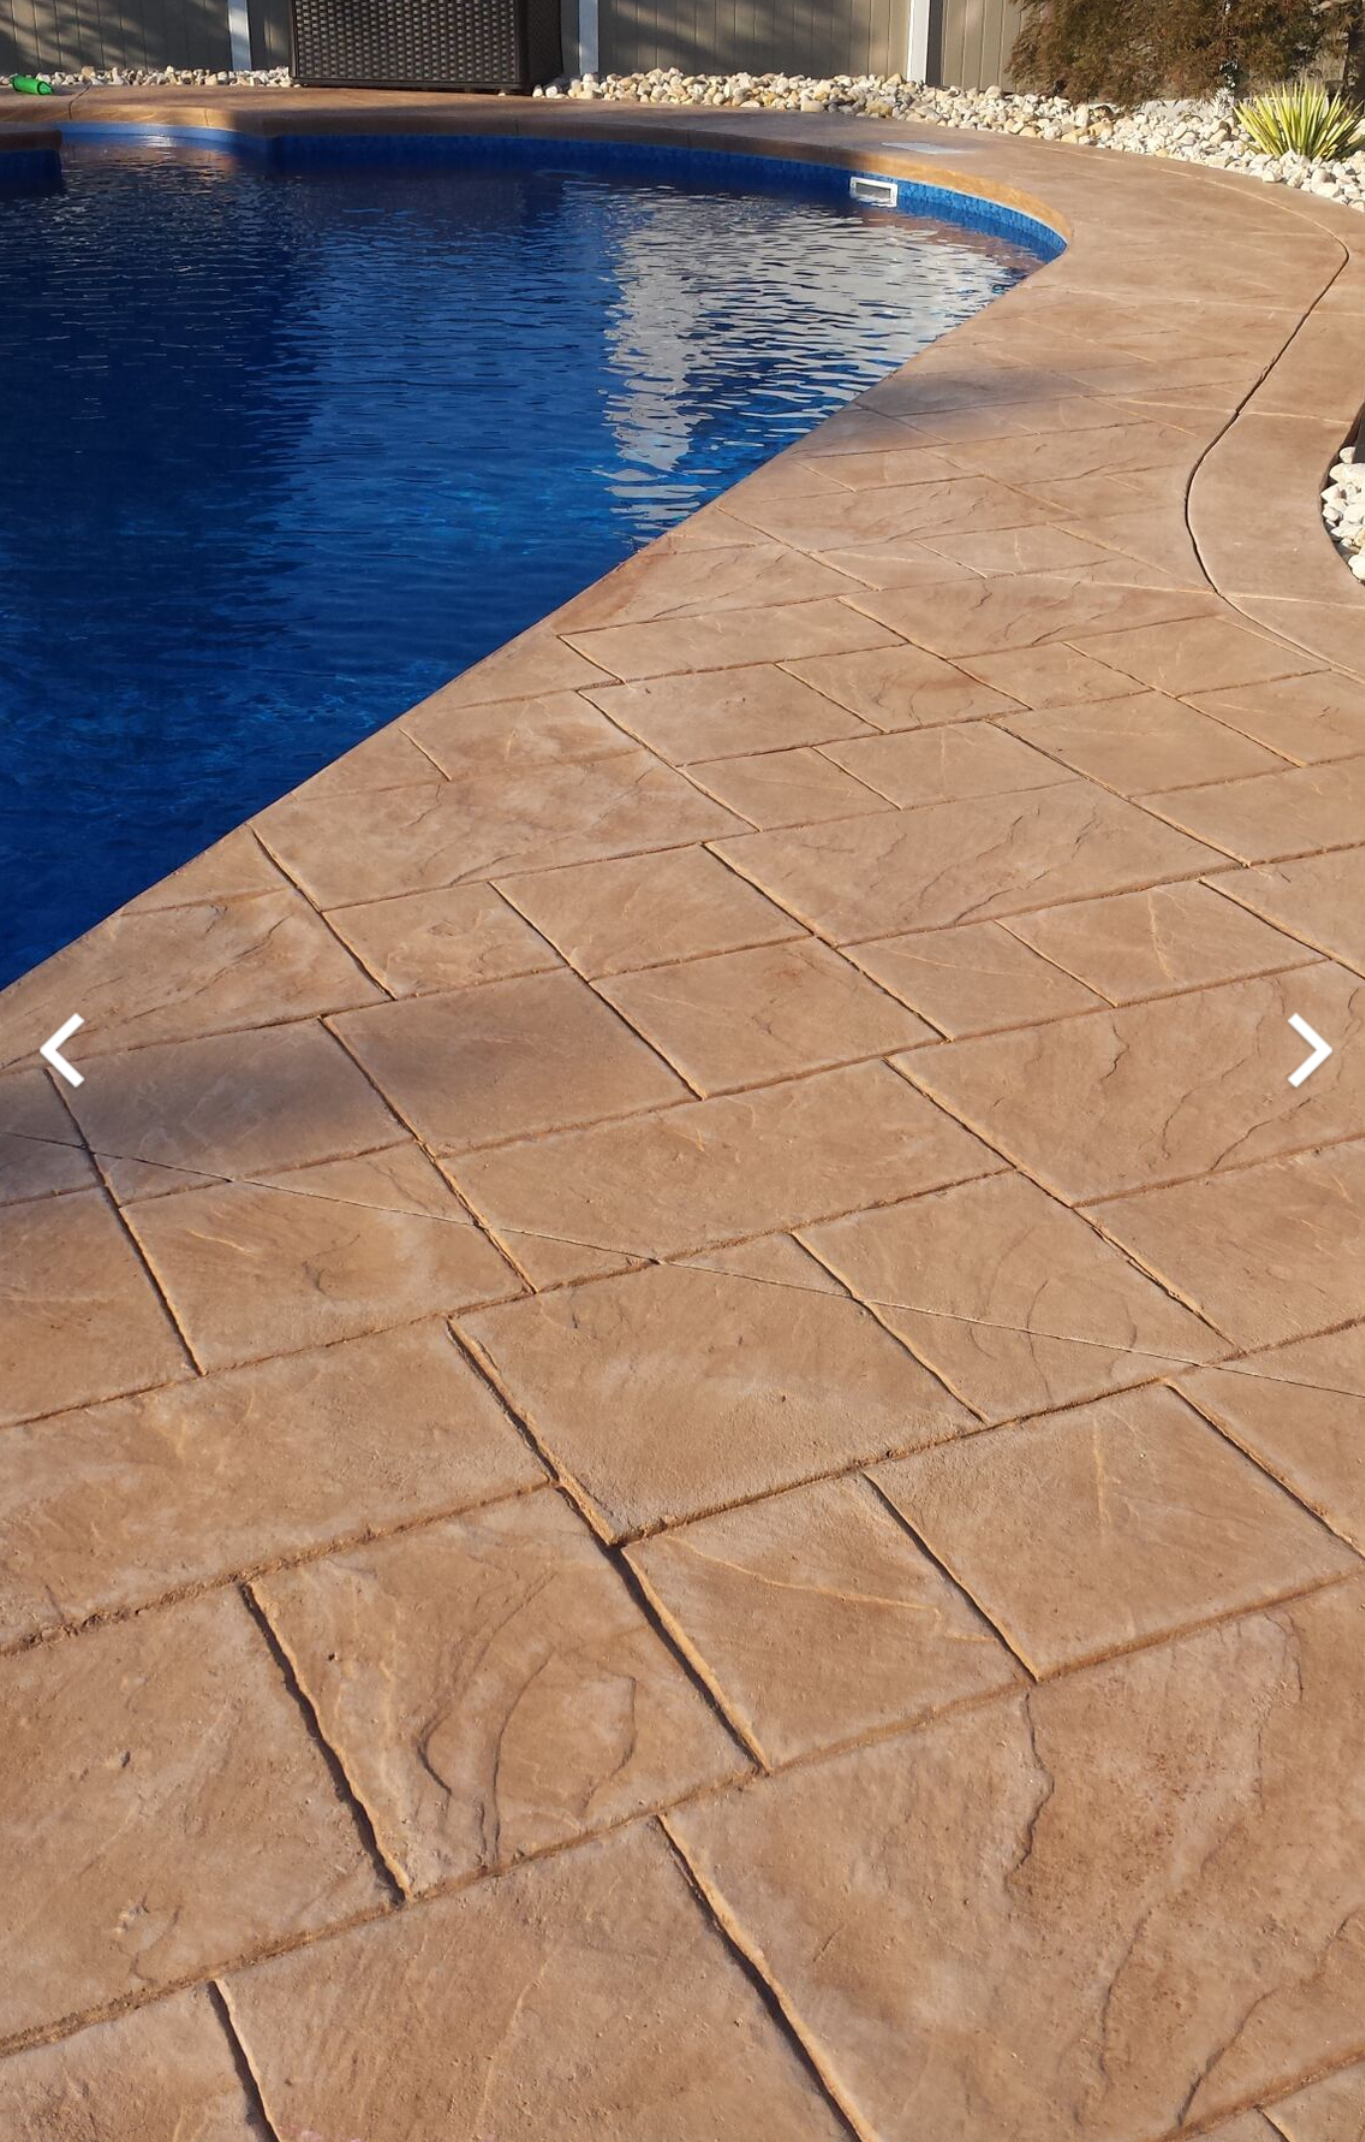 Large ashler slate fm 3150 Desert tan integral color Sunbaked clay highlights